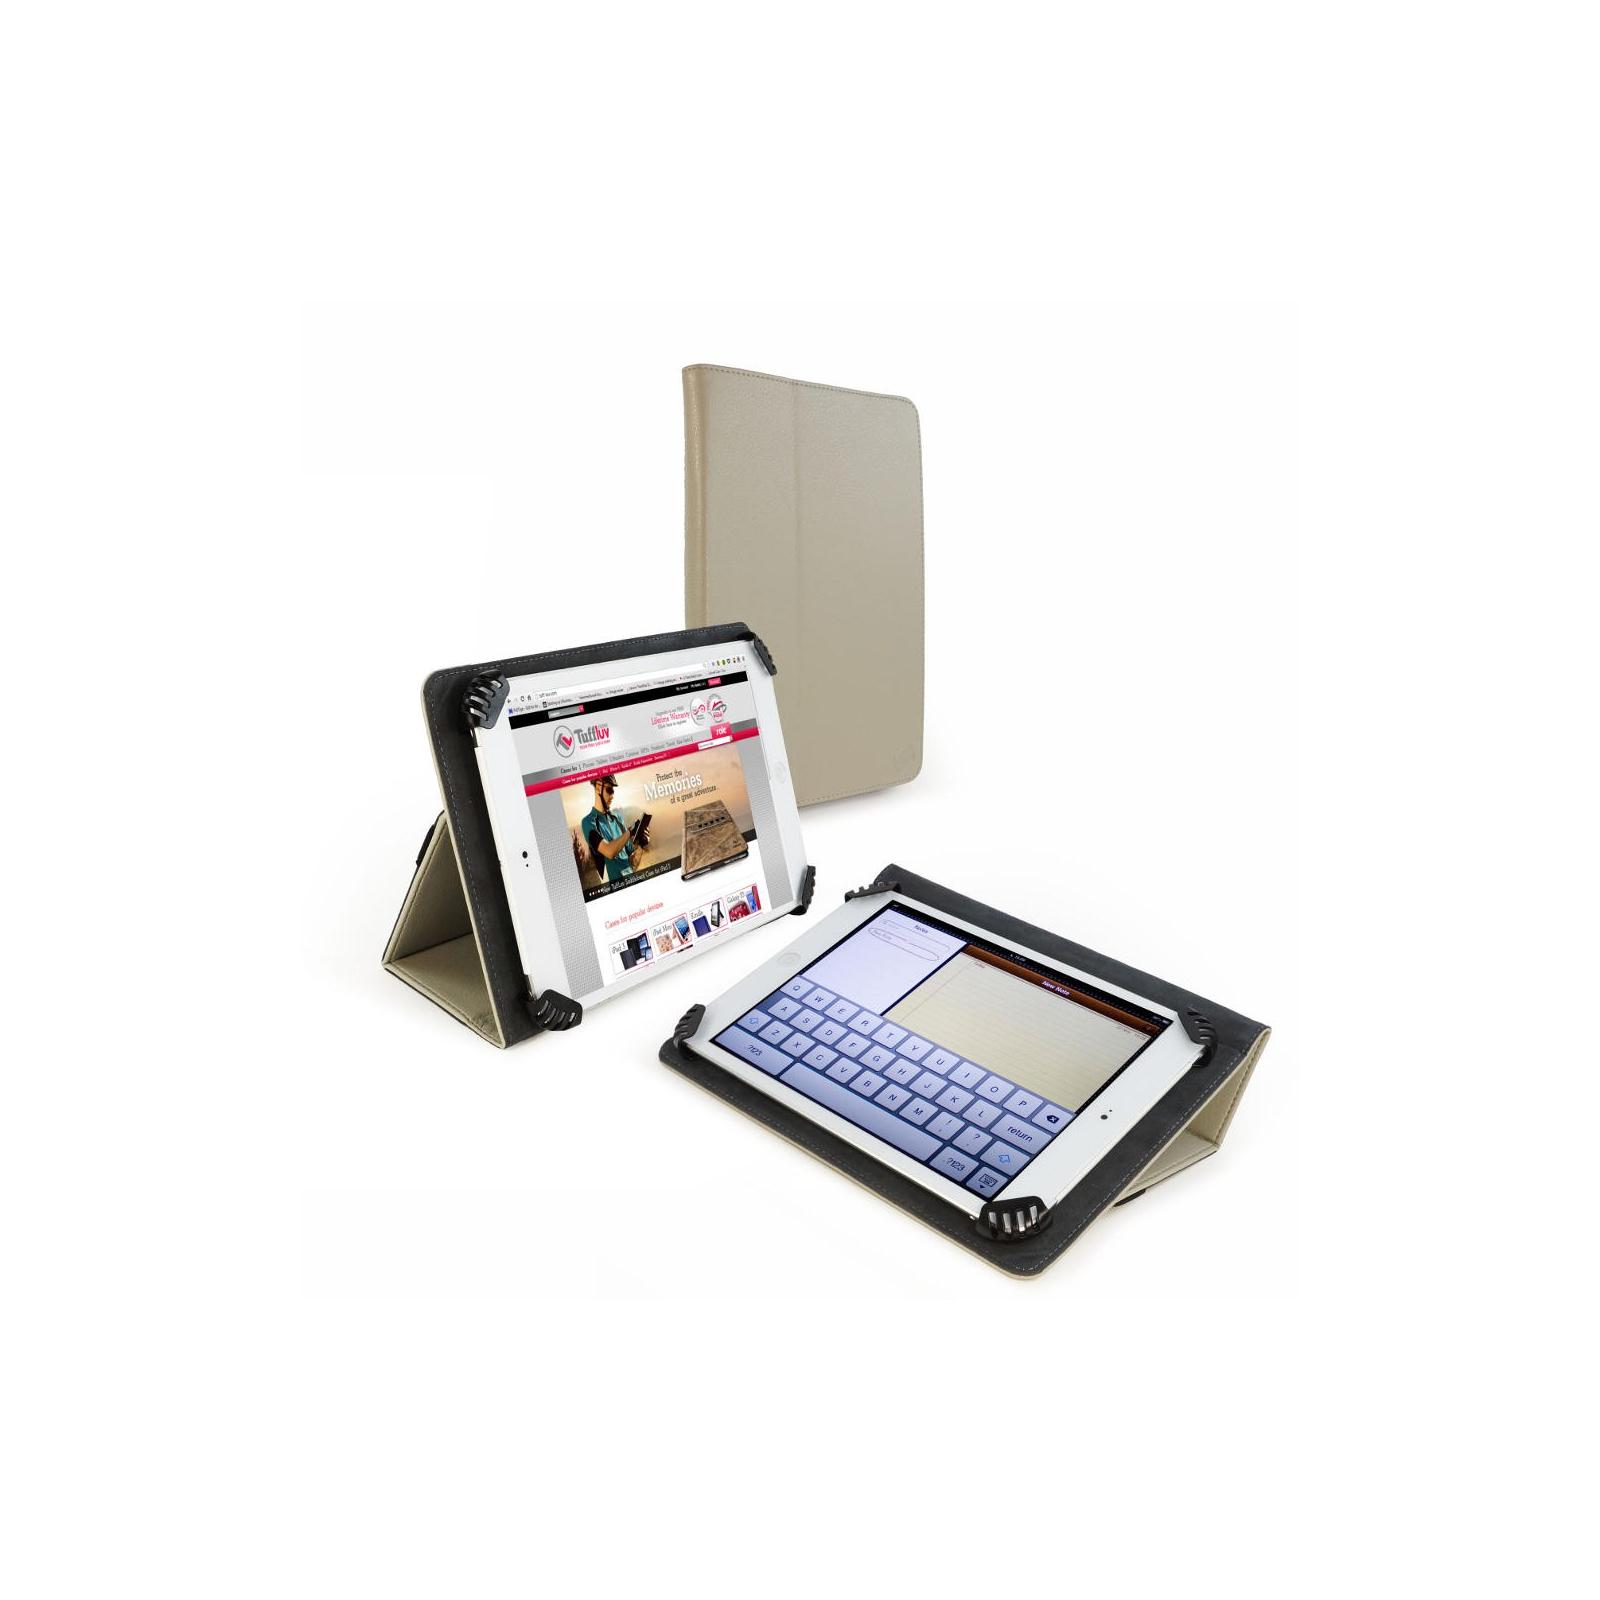 Чехол для планшета Tuff-Luv 7 Uni-View Gray (A3_42) изображение 5